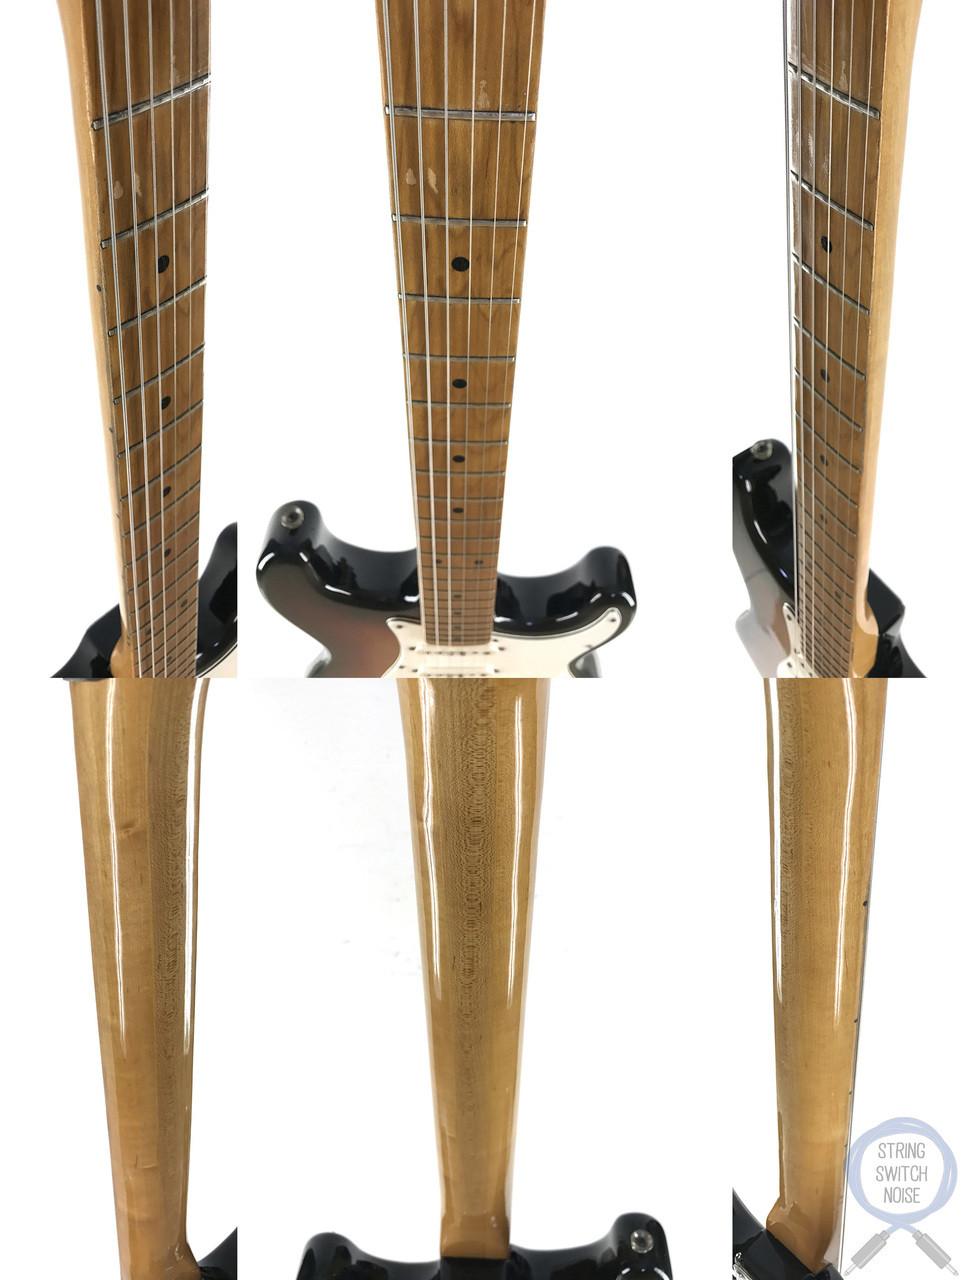 Greco Stratocaster, 3 Tone Sunburst, 1974 Vintage